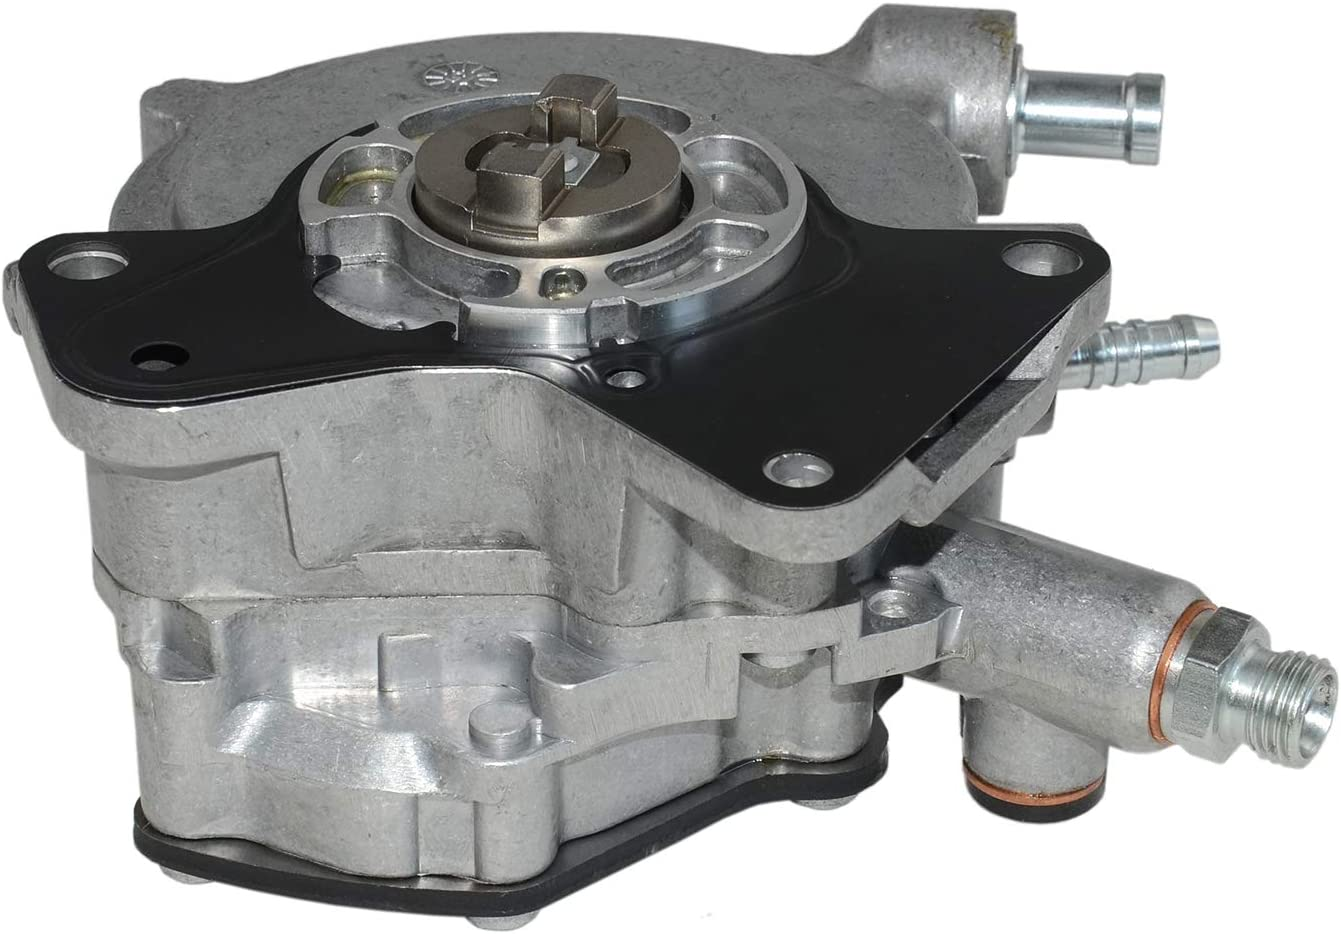 Vacuum Tandem Fuel Pump Repair Kit For VW Touareg Transporter Phaeton 2.5TDI